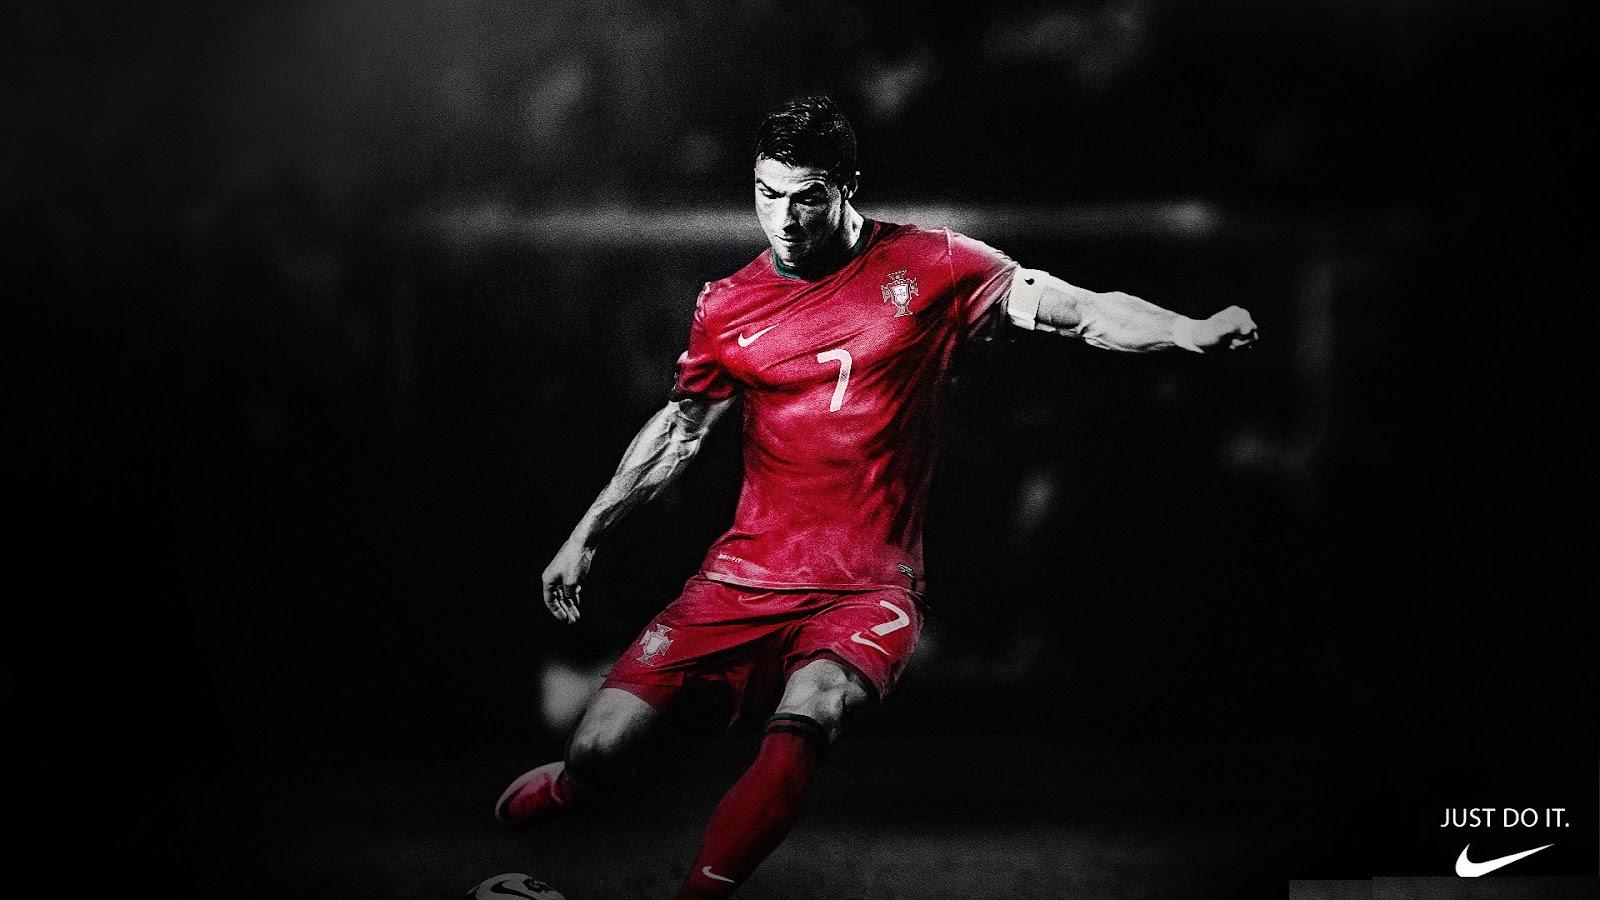 Por qué no Sillón Definitivo  Nike HD Wallpapers Cristiano Ronaldo - HD Wallpapers Storm | Free download  High Definition Wallpapers